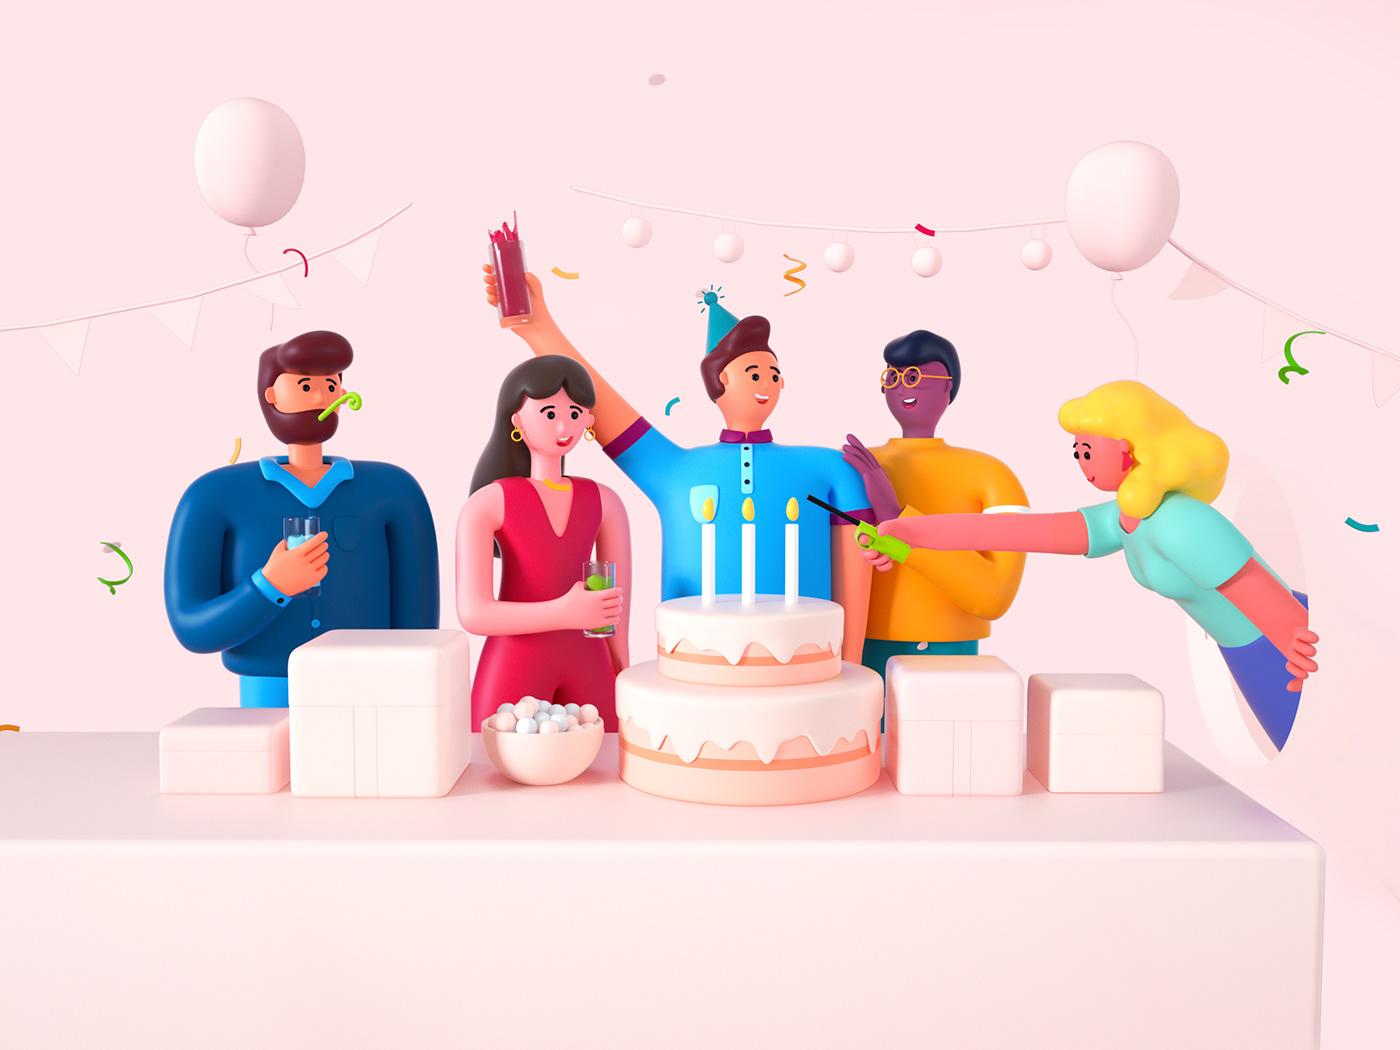 Image may contain: birthday cake, cartoon and cake